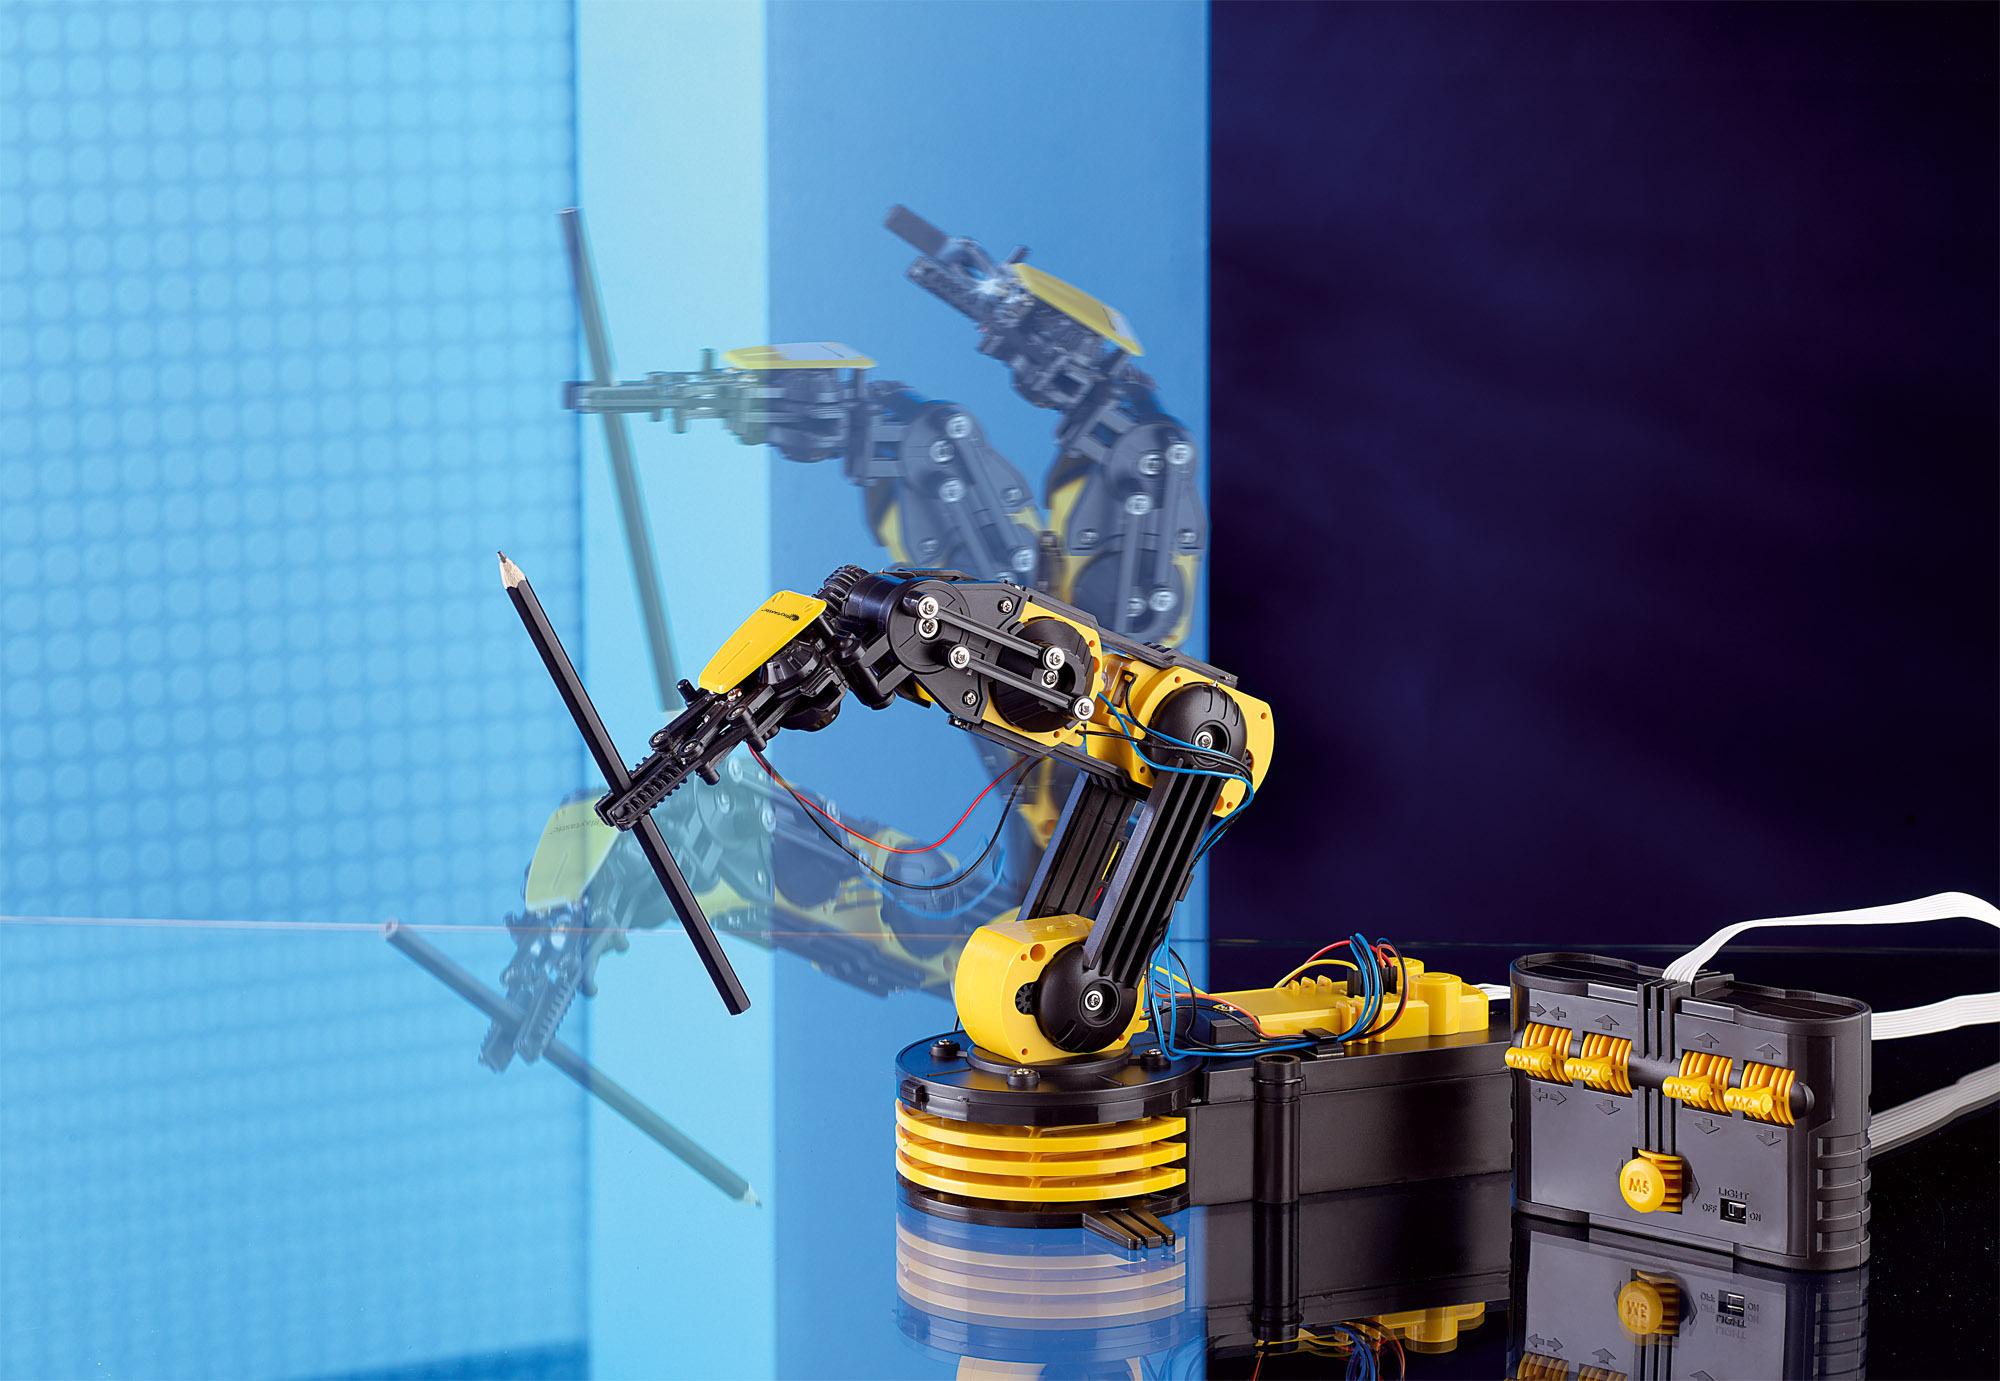 Playtastic Roboterarm Roboterarm selber Bauen Baukasten Roboter-Arm